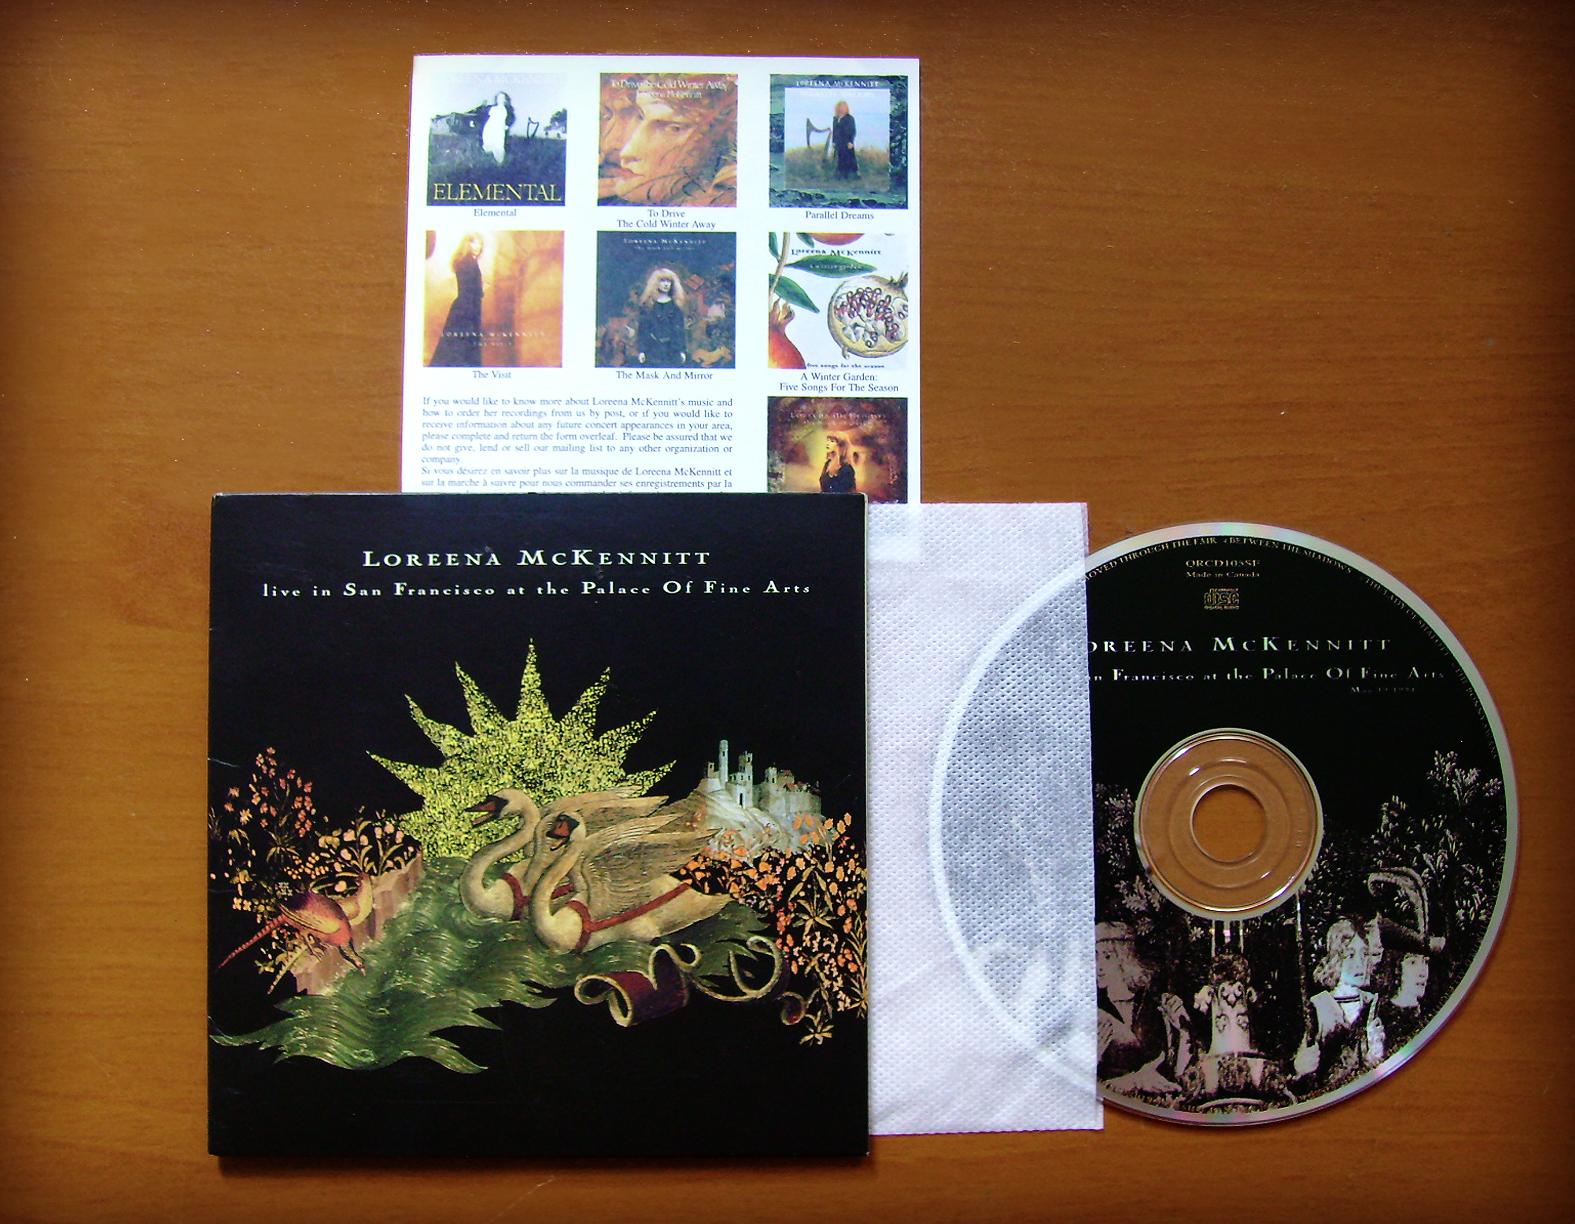 loreena mckennitt collection 1994 live in san francisco at the